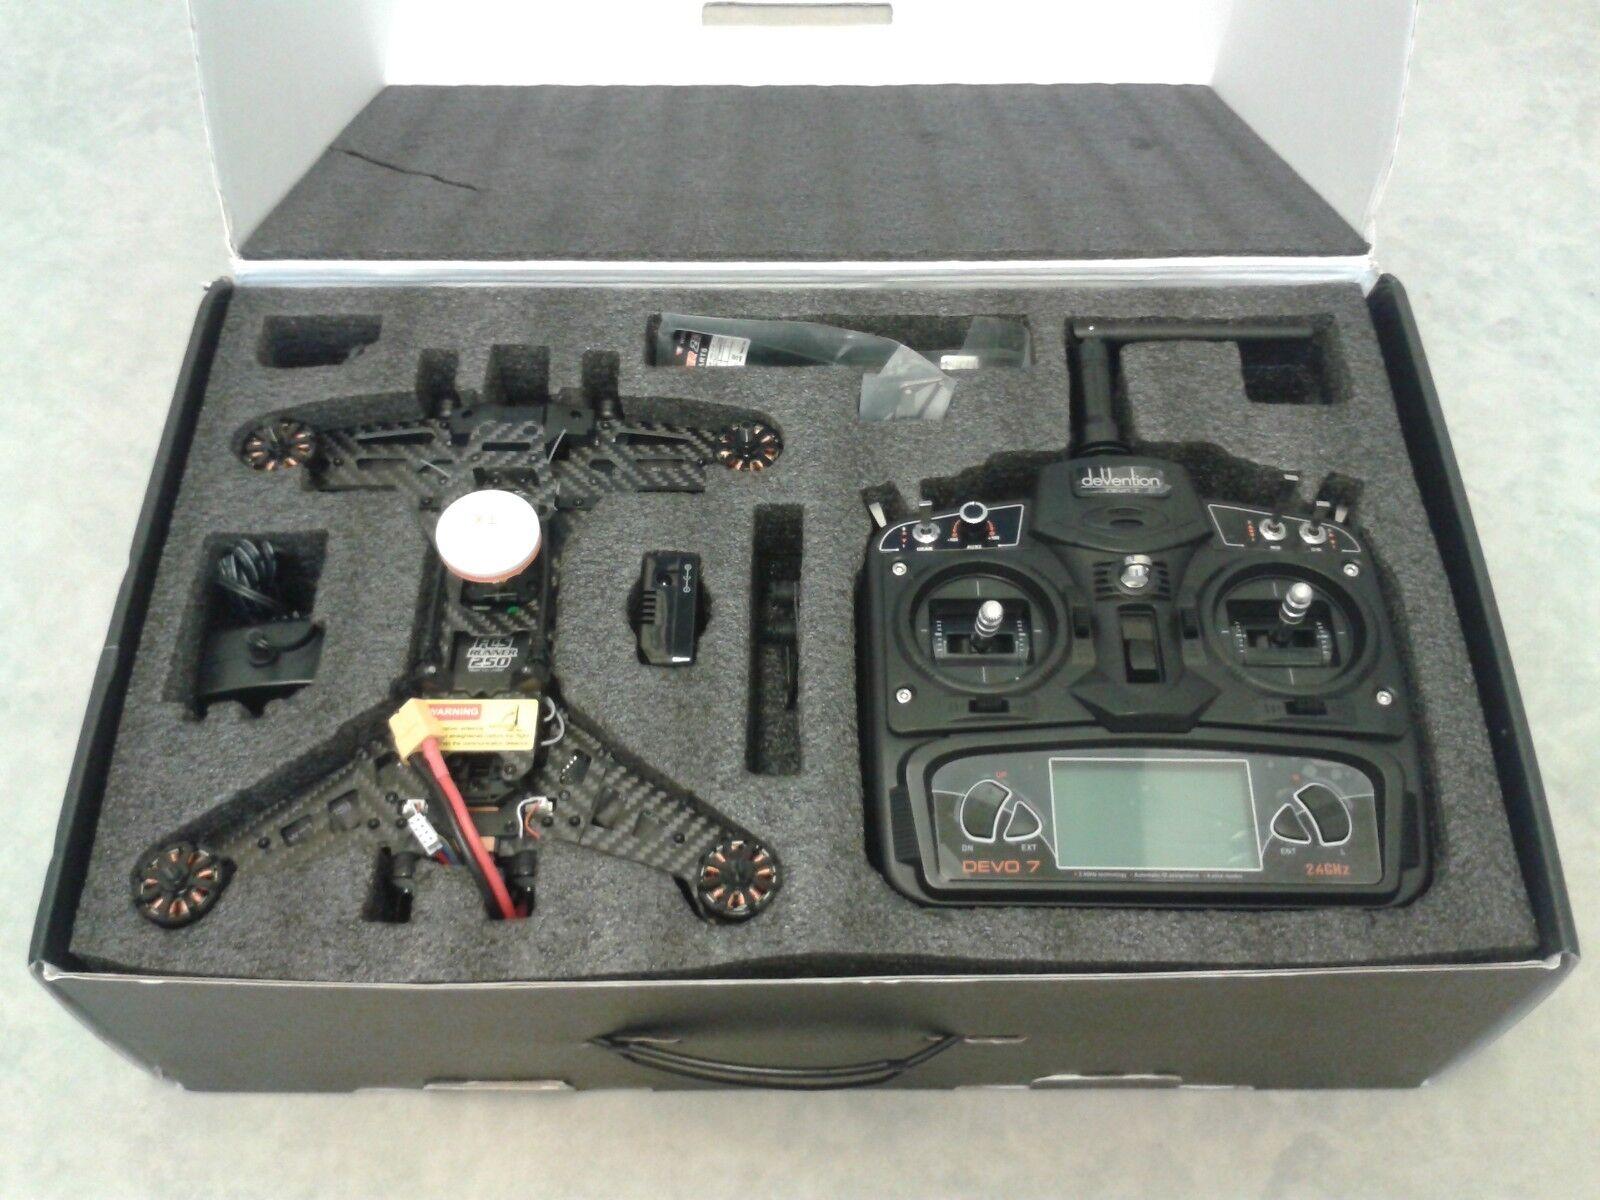 WALKERA Runner 250 RC Quadcopter Racing Drone FPV Camera 5.8GHz DEVO 7 Tx RTF